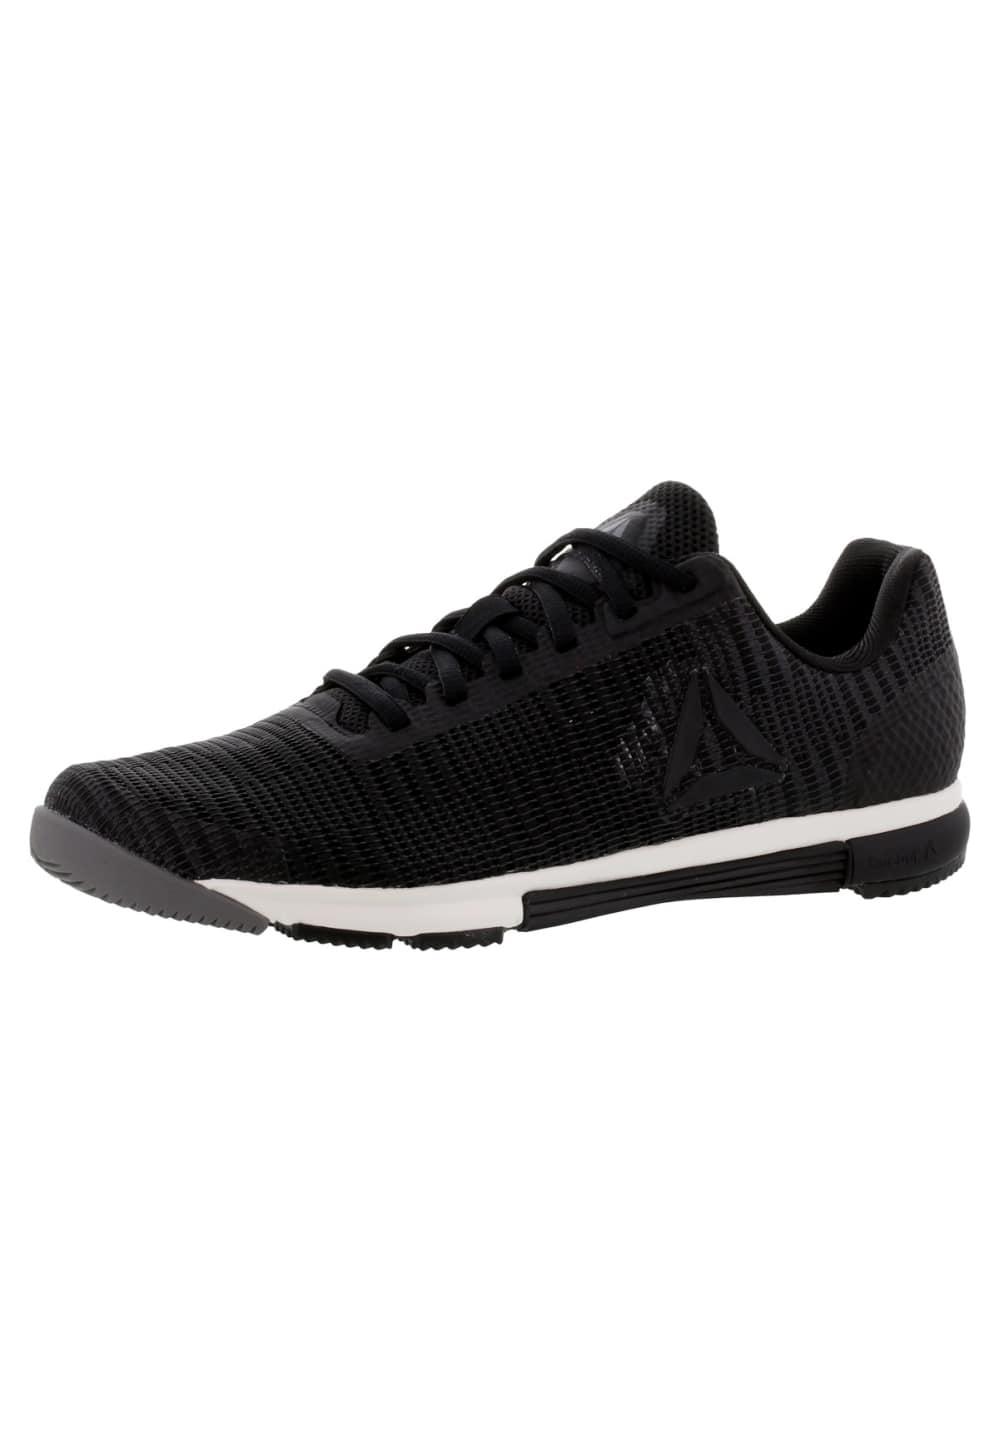 da8325b597d Reebok SPEED TR FLEXWEAVE - Fitness shoes for Women - Black